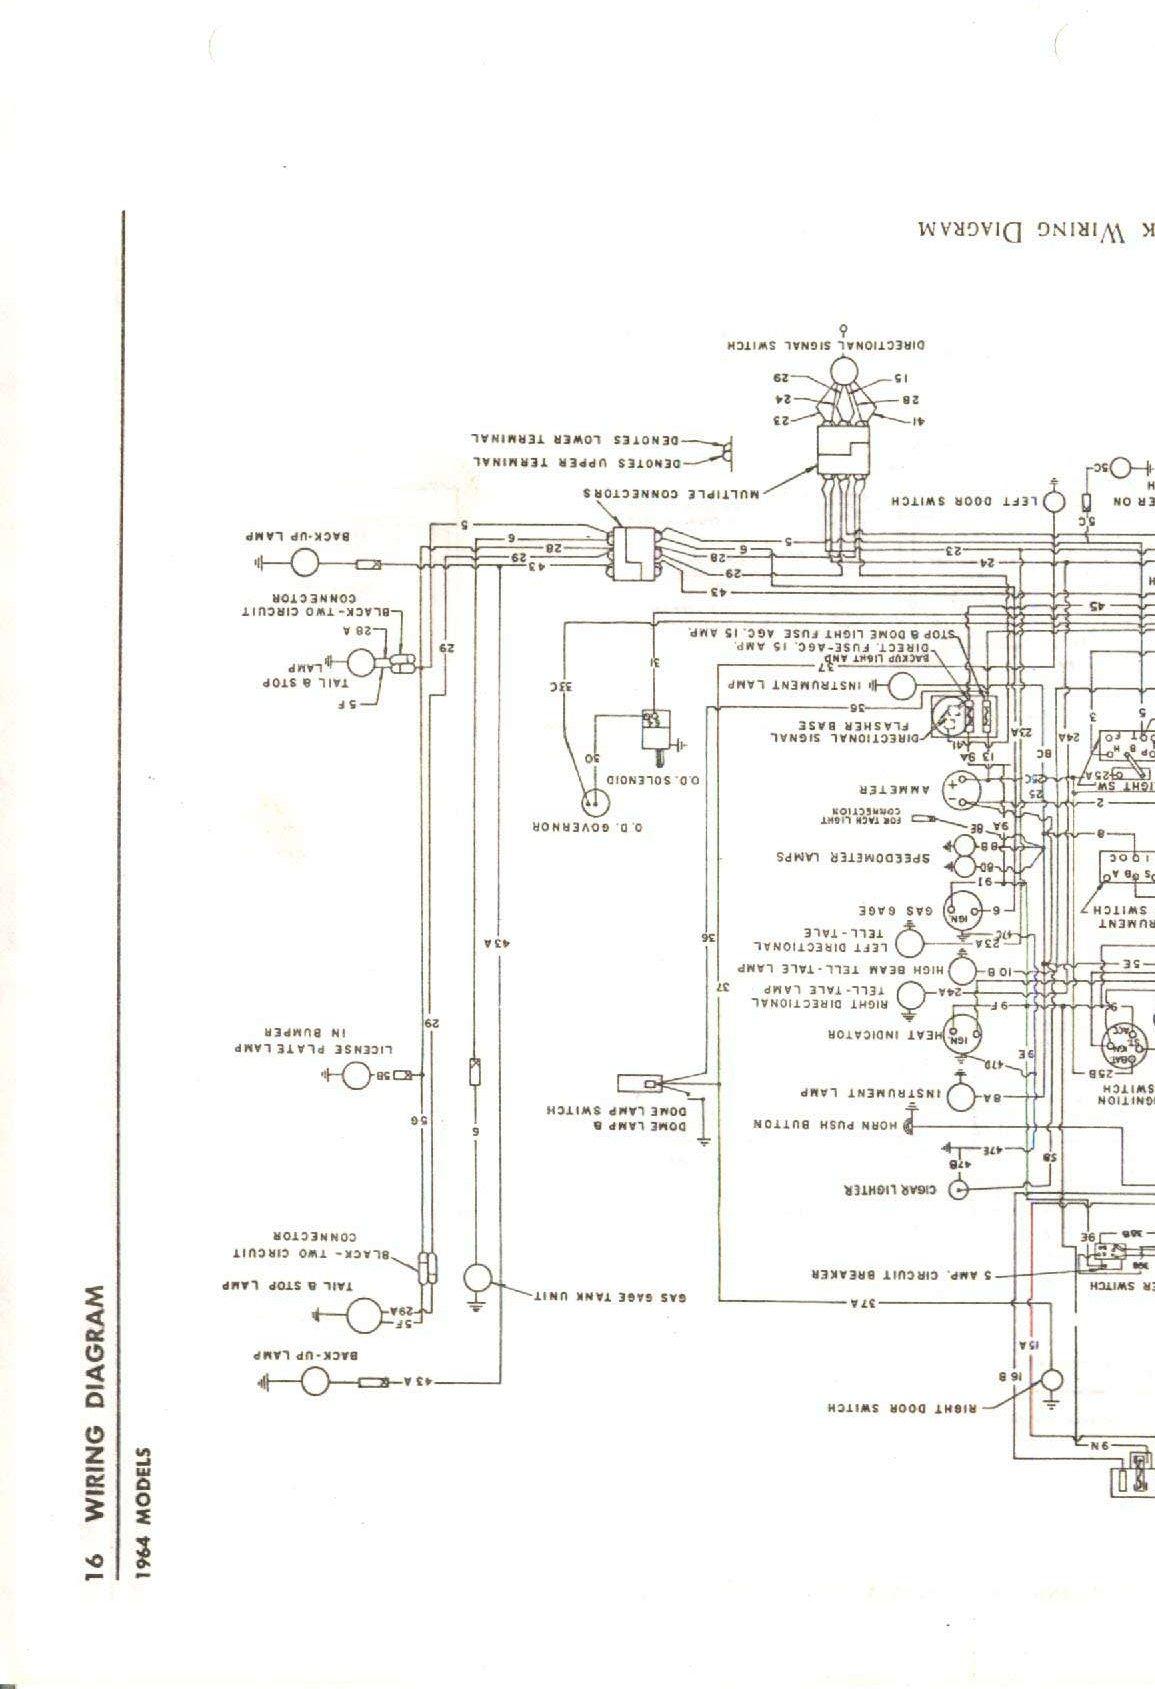 wiring diagram for 1963 64 studebaker avanti